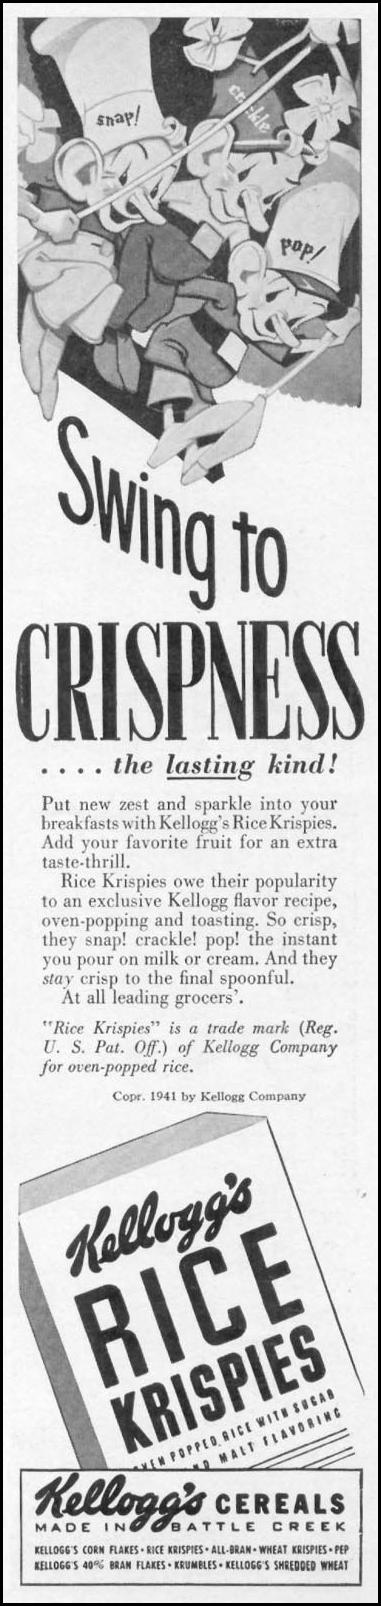 KELLOGG'S RICE KRISPIES WOMAN'S DAY 05/01/1941 p. 55